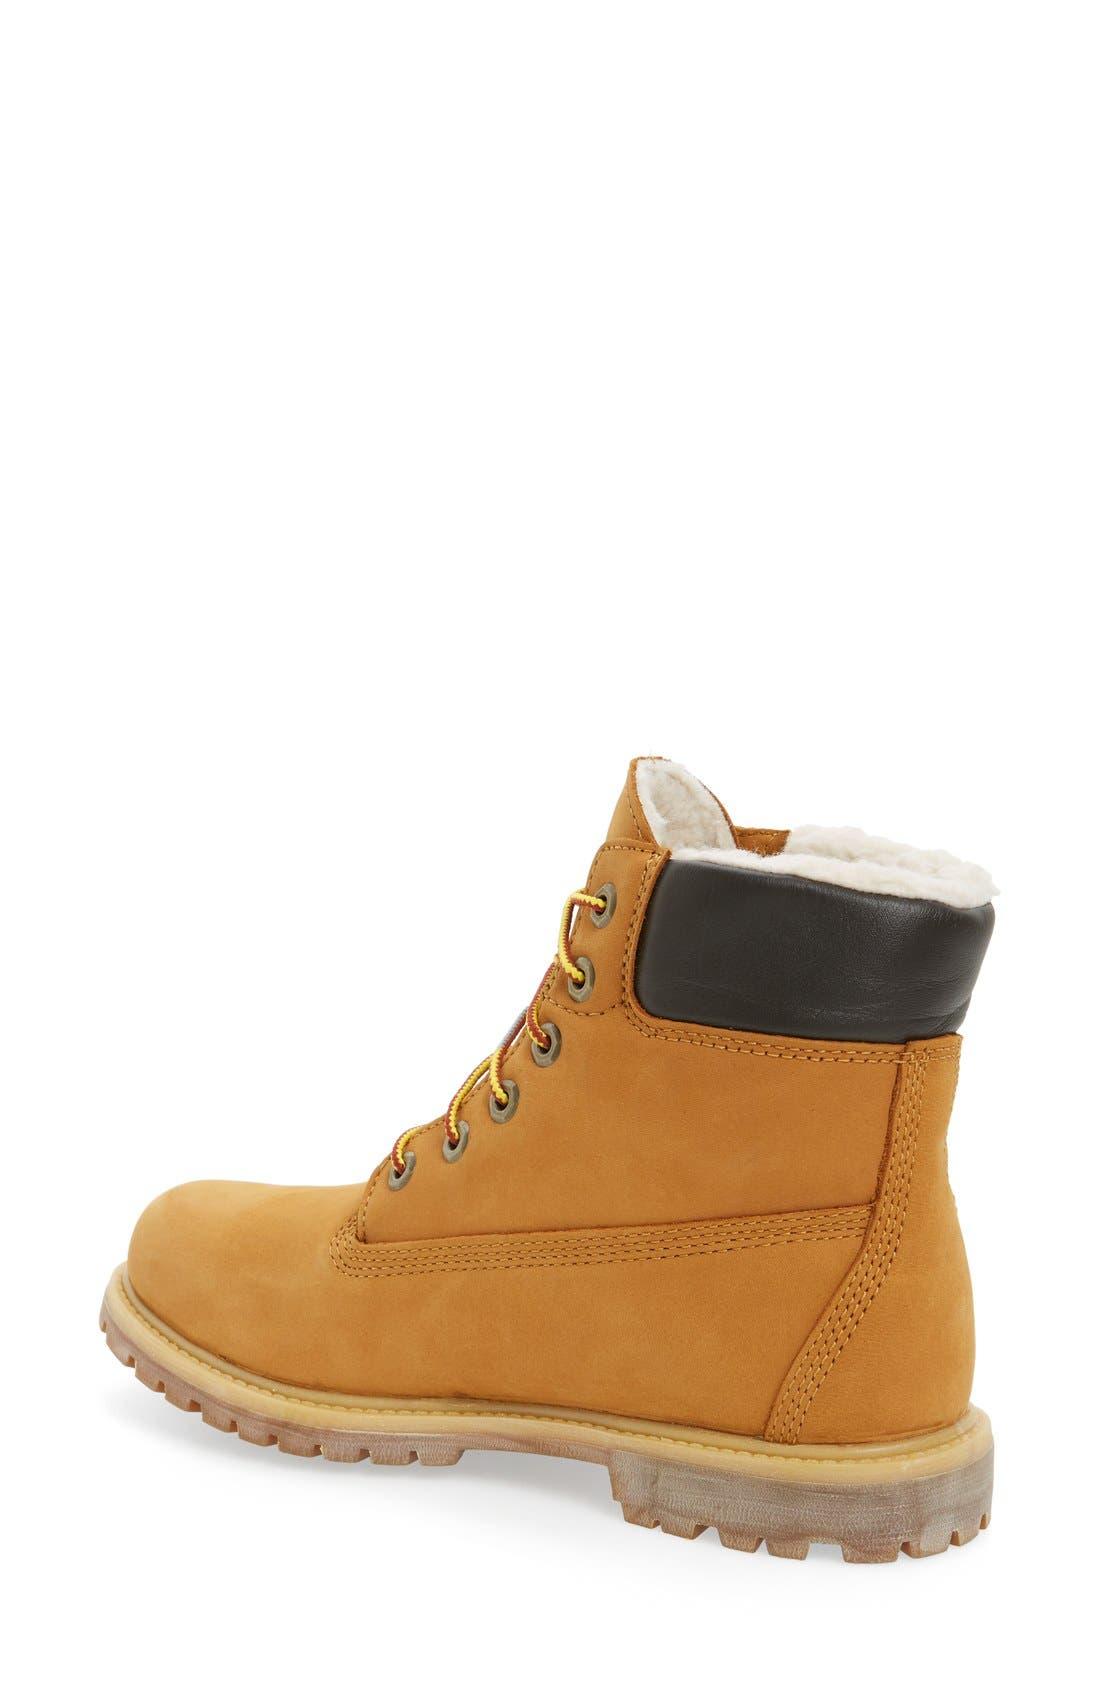 Alternate Image 2  - Timberland 6 Inch Waterproof Boot (Women)